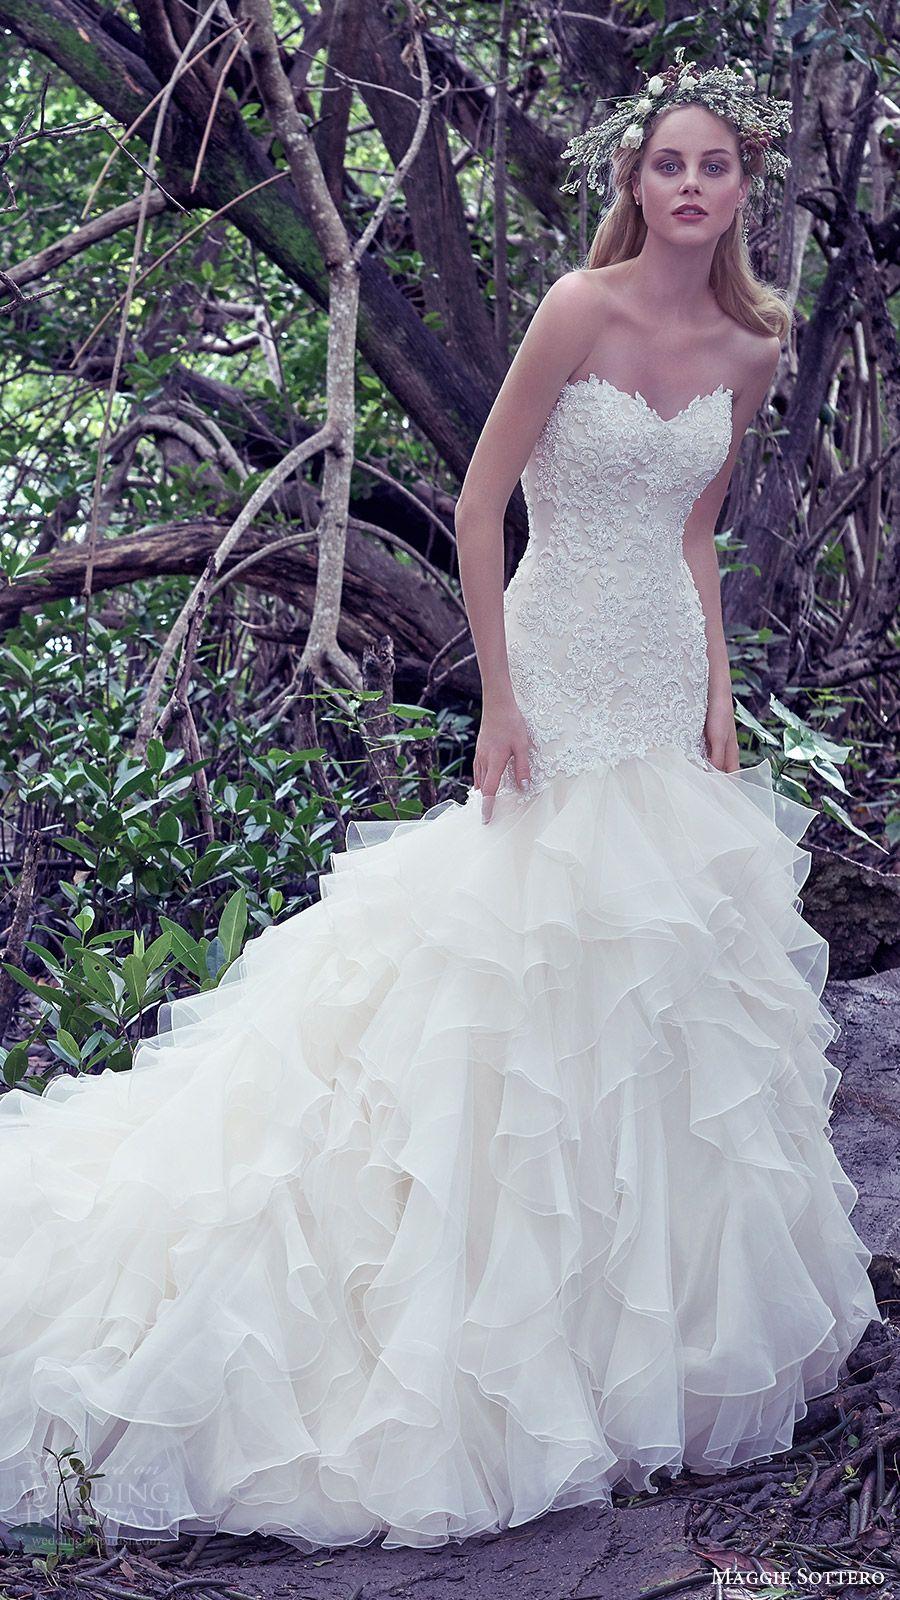 Mermaid ruffle wedding dress  Maggie Sottero Fall  Wedding Dresses u ucLisetteud Bridal